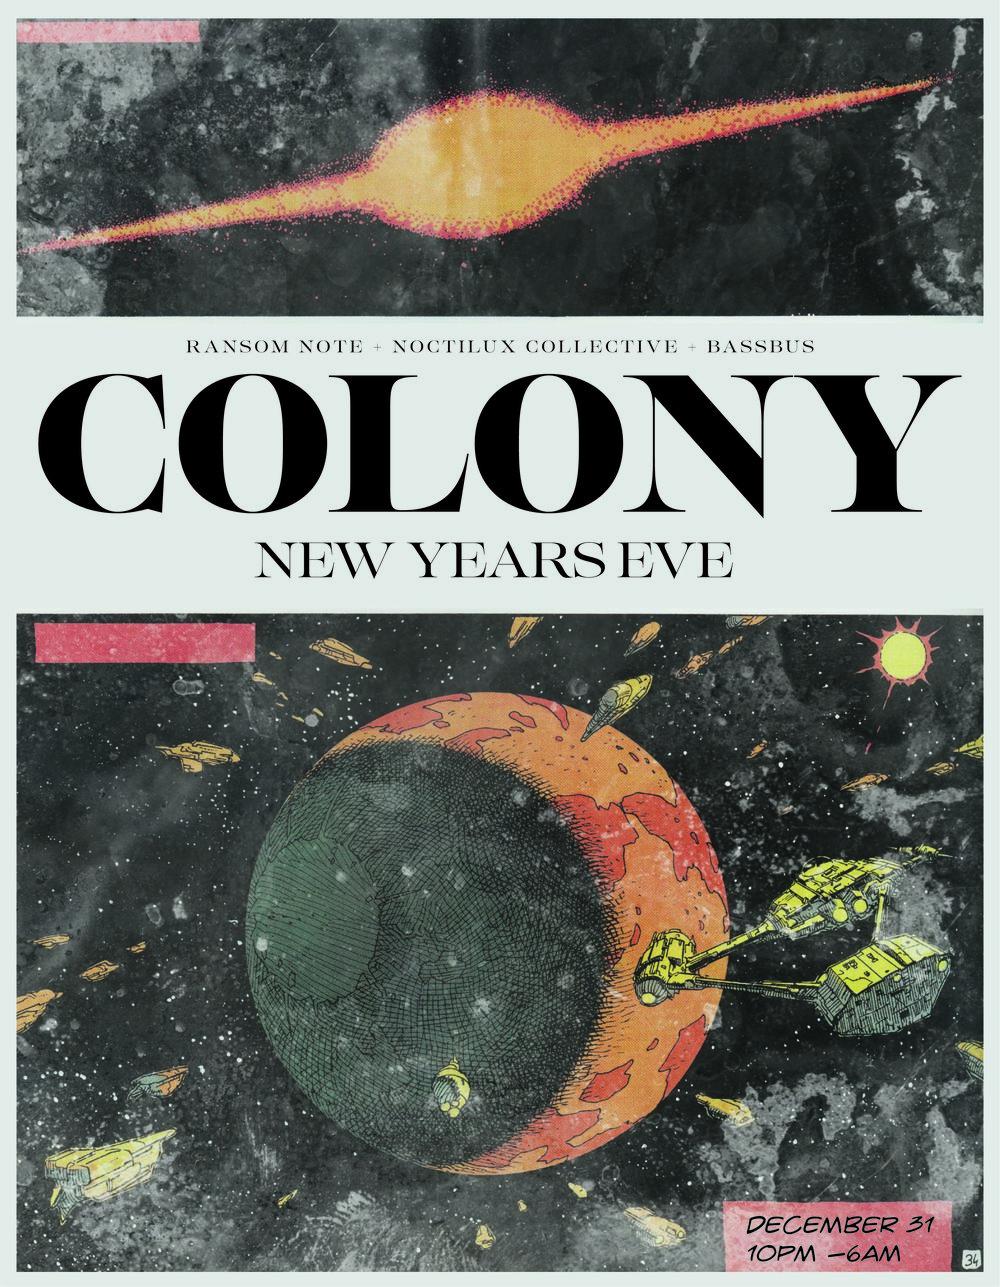 colony-NYE-noctilux collective.jpeg